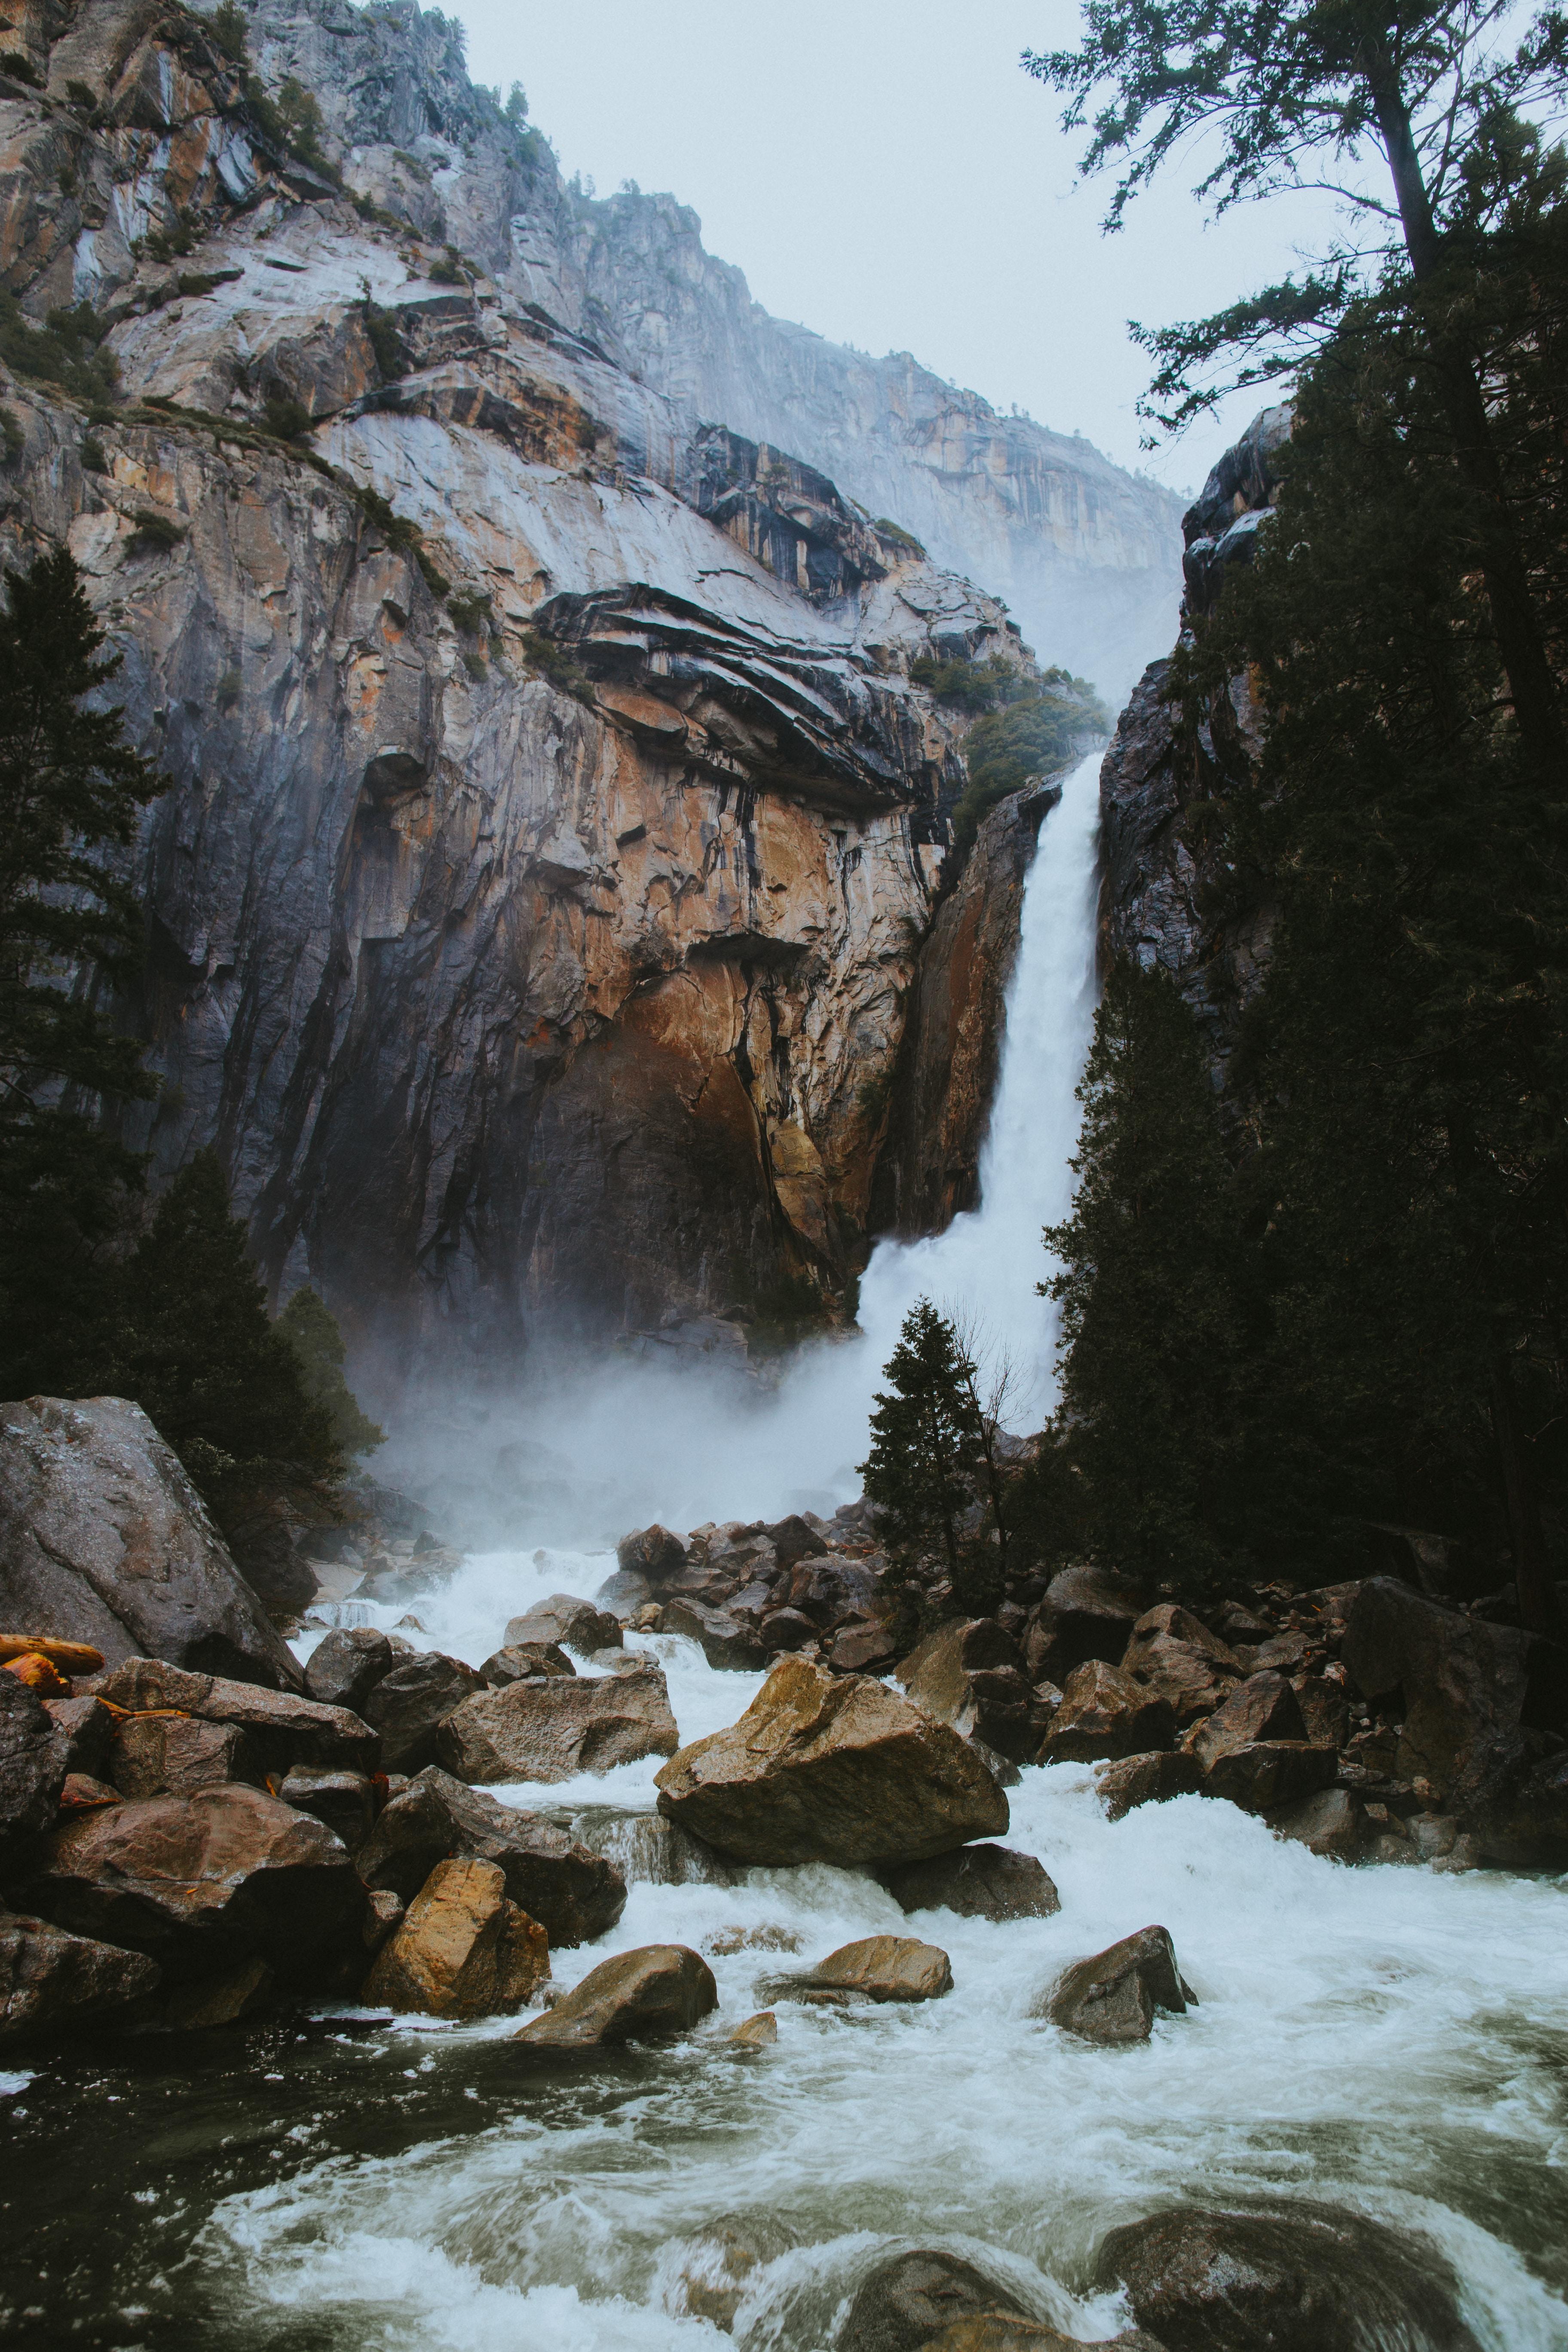 river stream between rocks during daytime